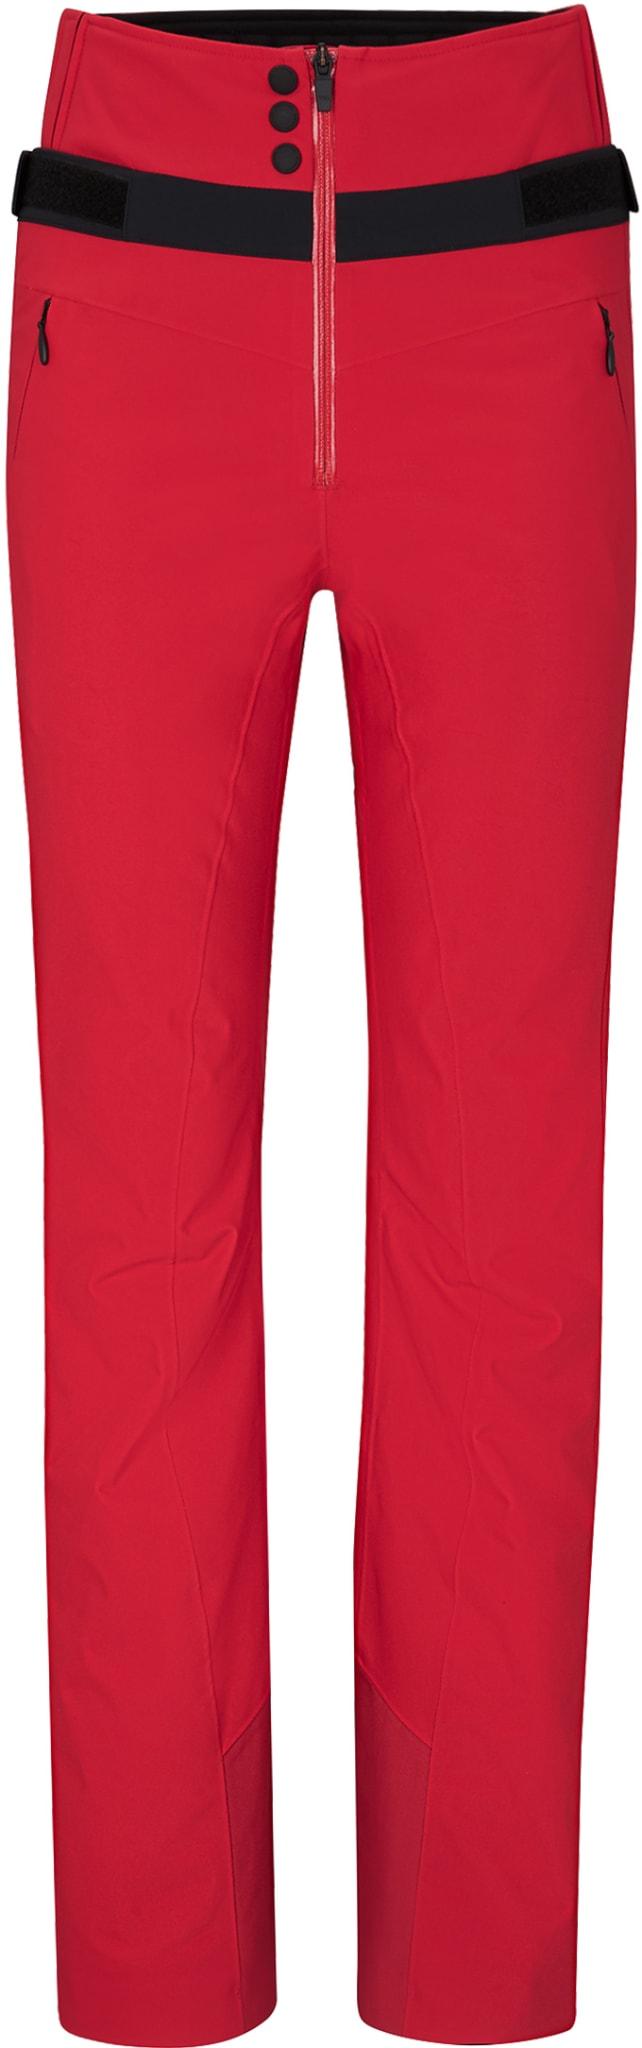 Borja 2 Strech Ski Pant